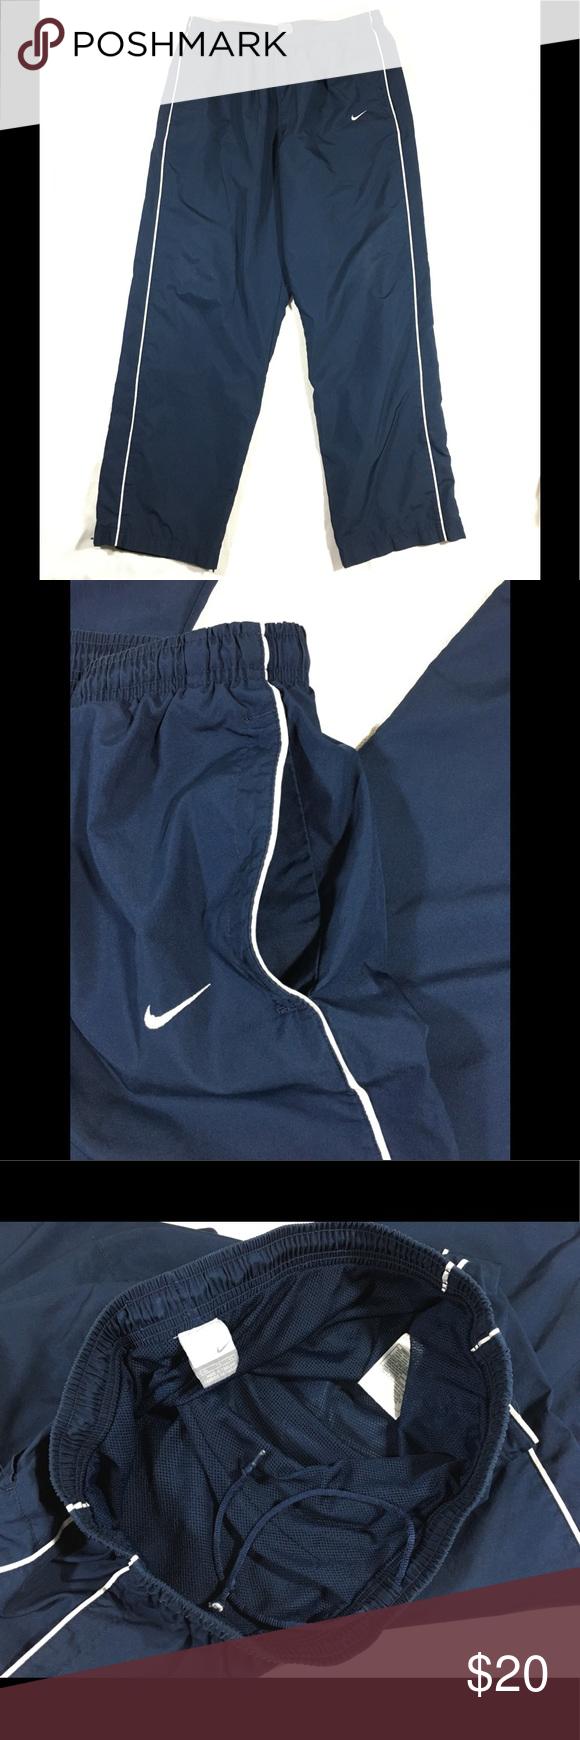 0a9b23a28a361 NIKE Mens Pants Mesh Lined Wind stripe XL NIKE Mesh Lined Sport / Athletic Wind  Pants